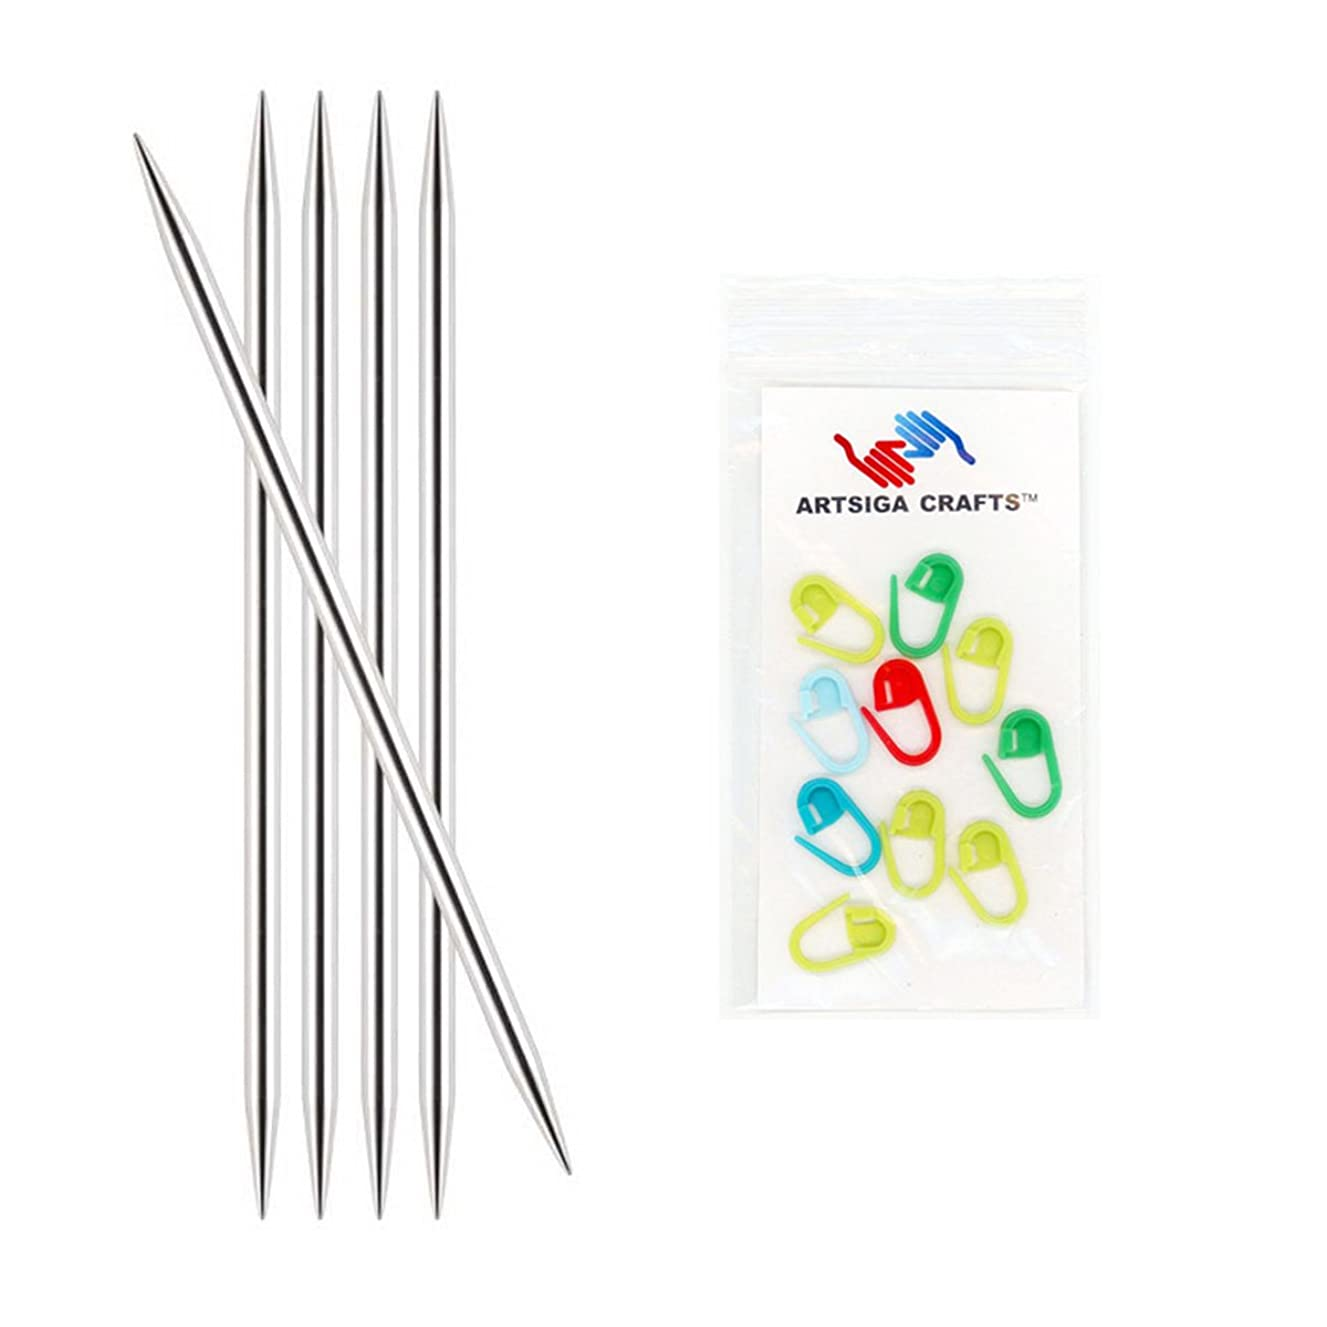 Knitter's Pride Nova Platina Double Point 6-inch (15cm) Knitting Needles (Set of 5) Size 2 (2.75mm) Bundle with 10 Artsiga Crafts Stitch Markers 120124